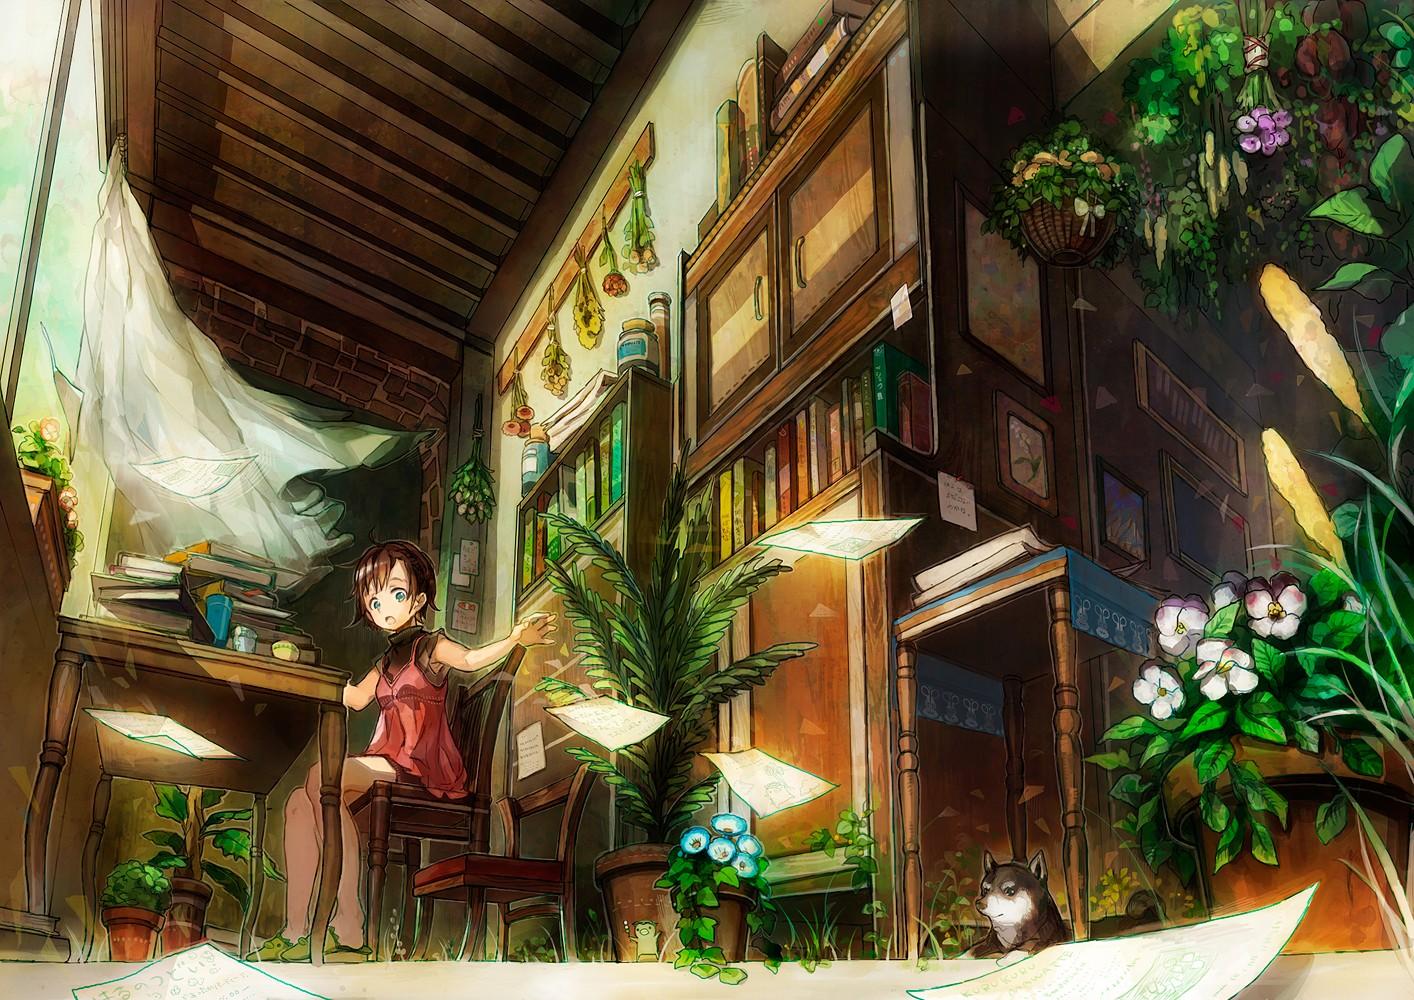 Scenic Anime Wallpaper 1414x1000 Scenic Anime Girls 1414x1000